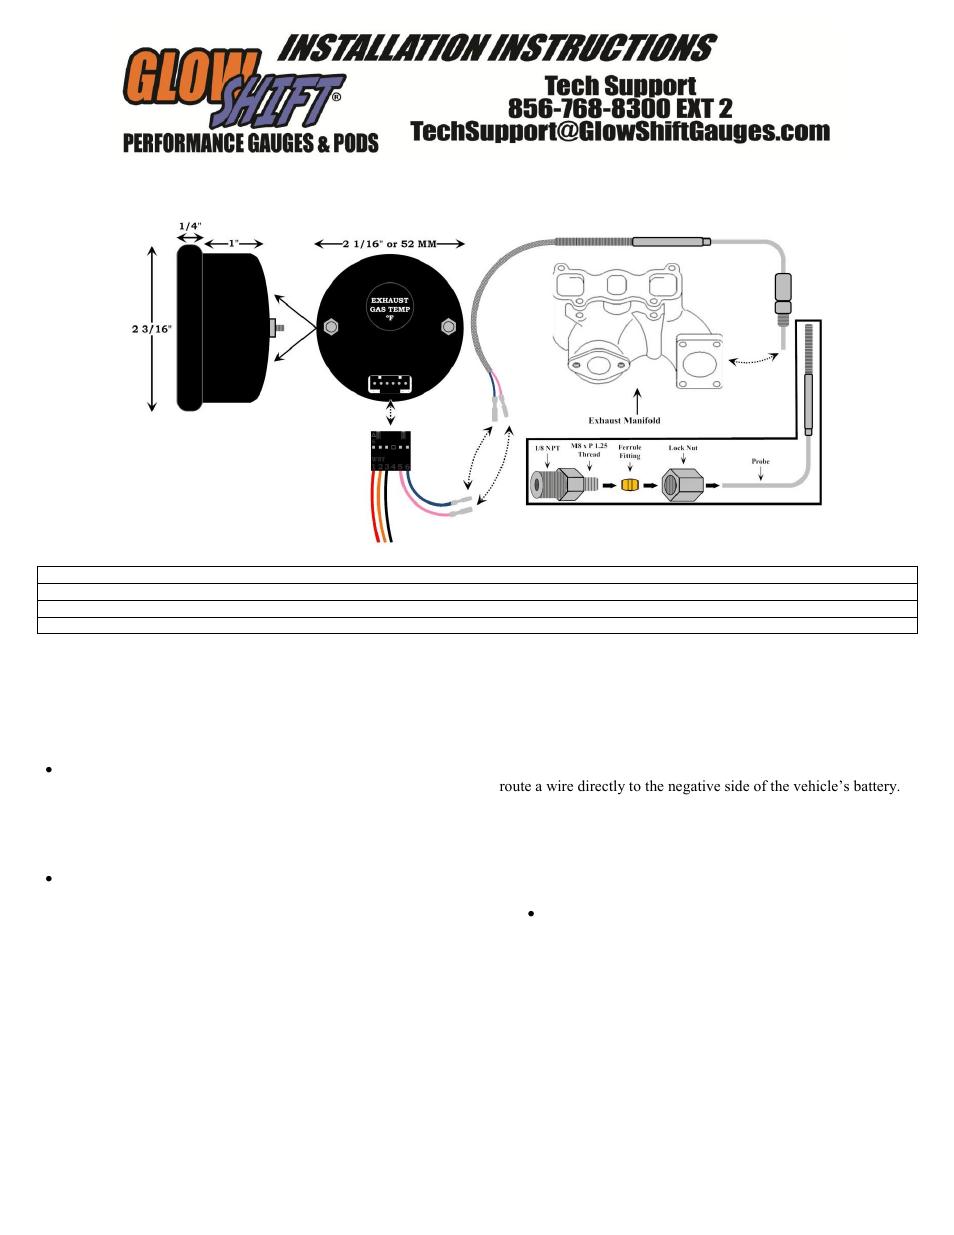 Egt Wiring Diagram - Wiring Diagram Site on